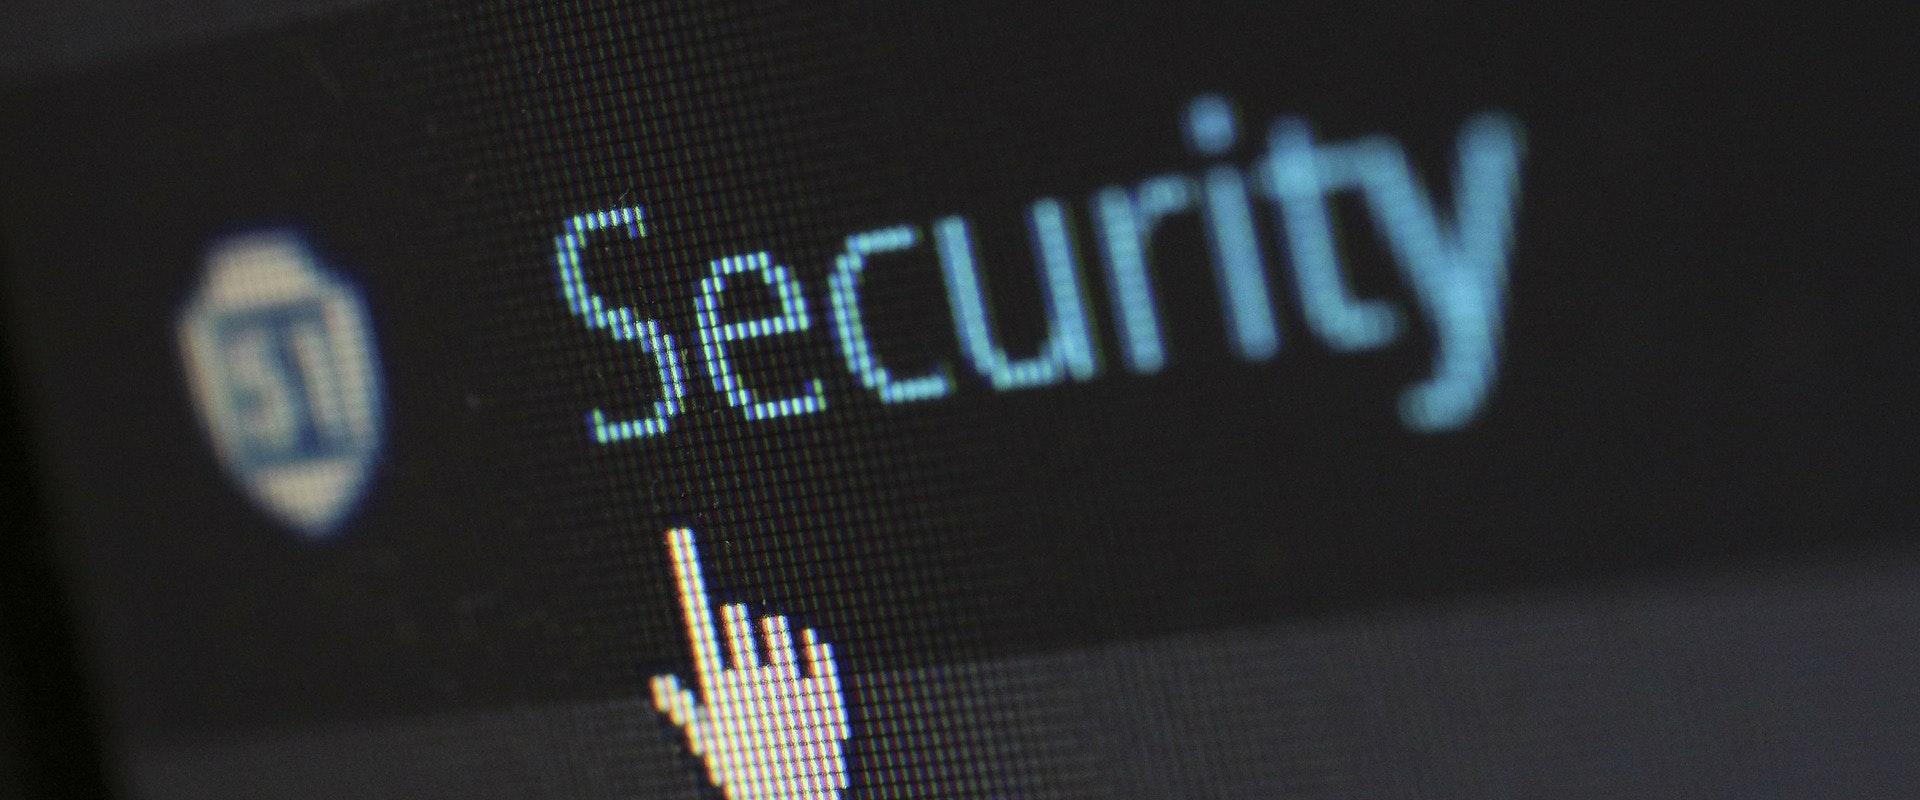 1554198072 security 2651301920